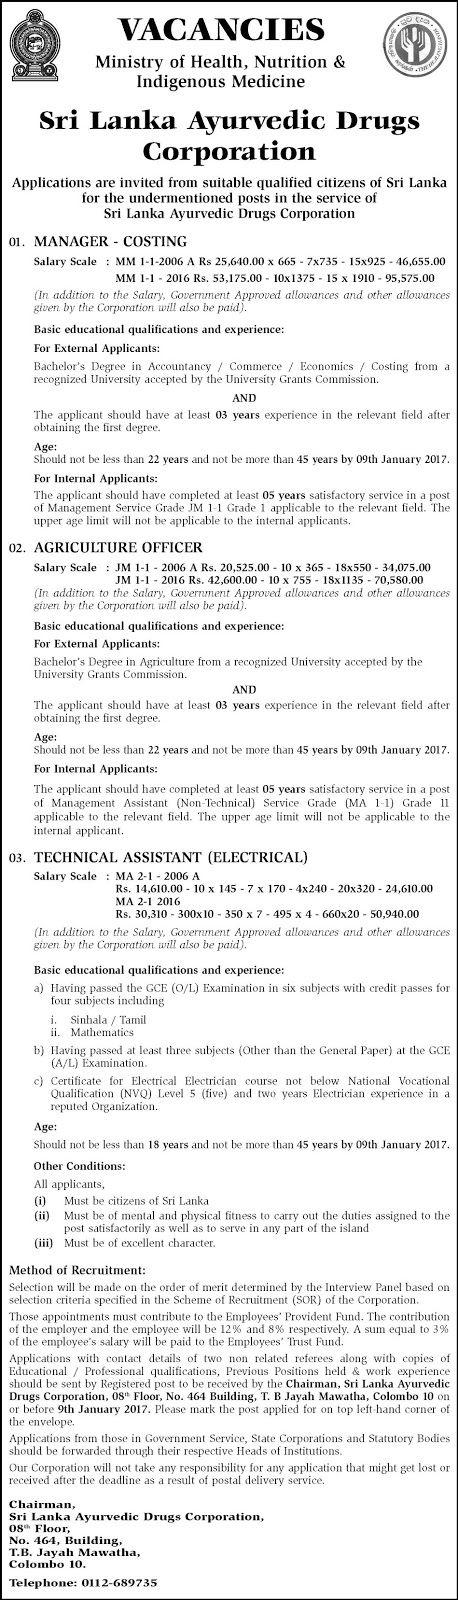 Pin on Government Jobs & Vacancies in Sri Lanka